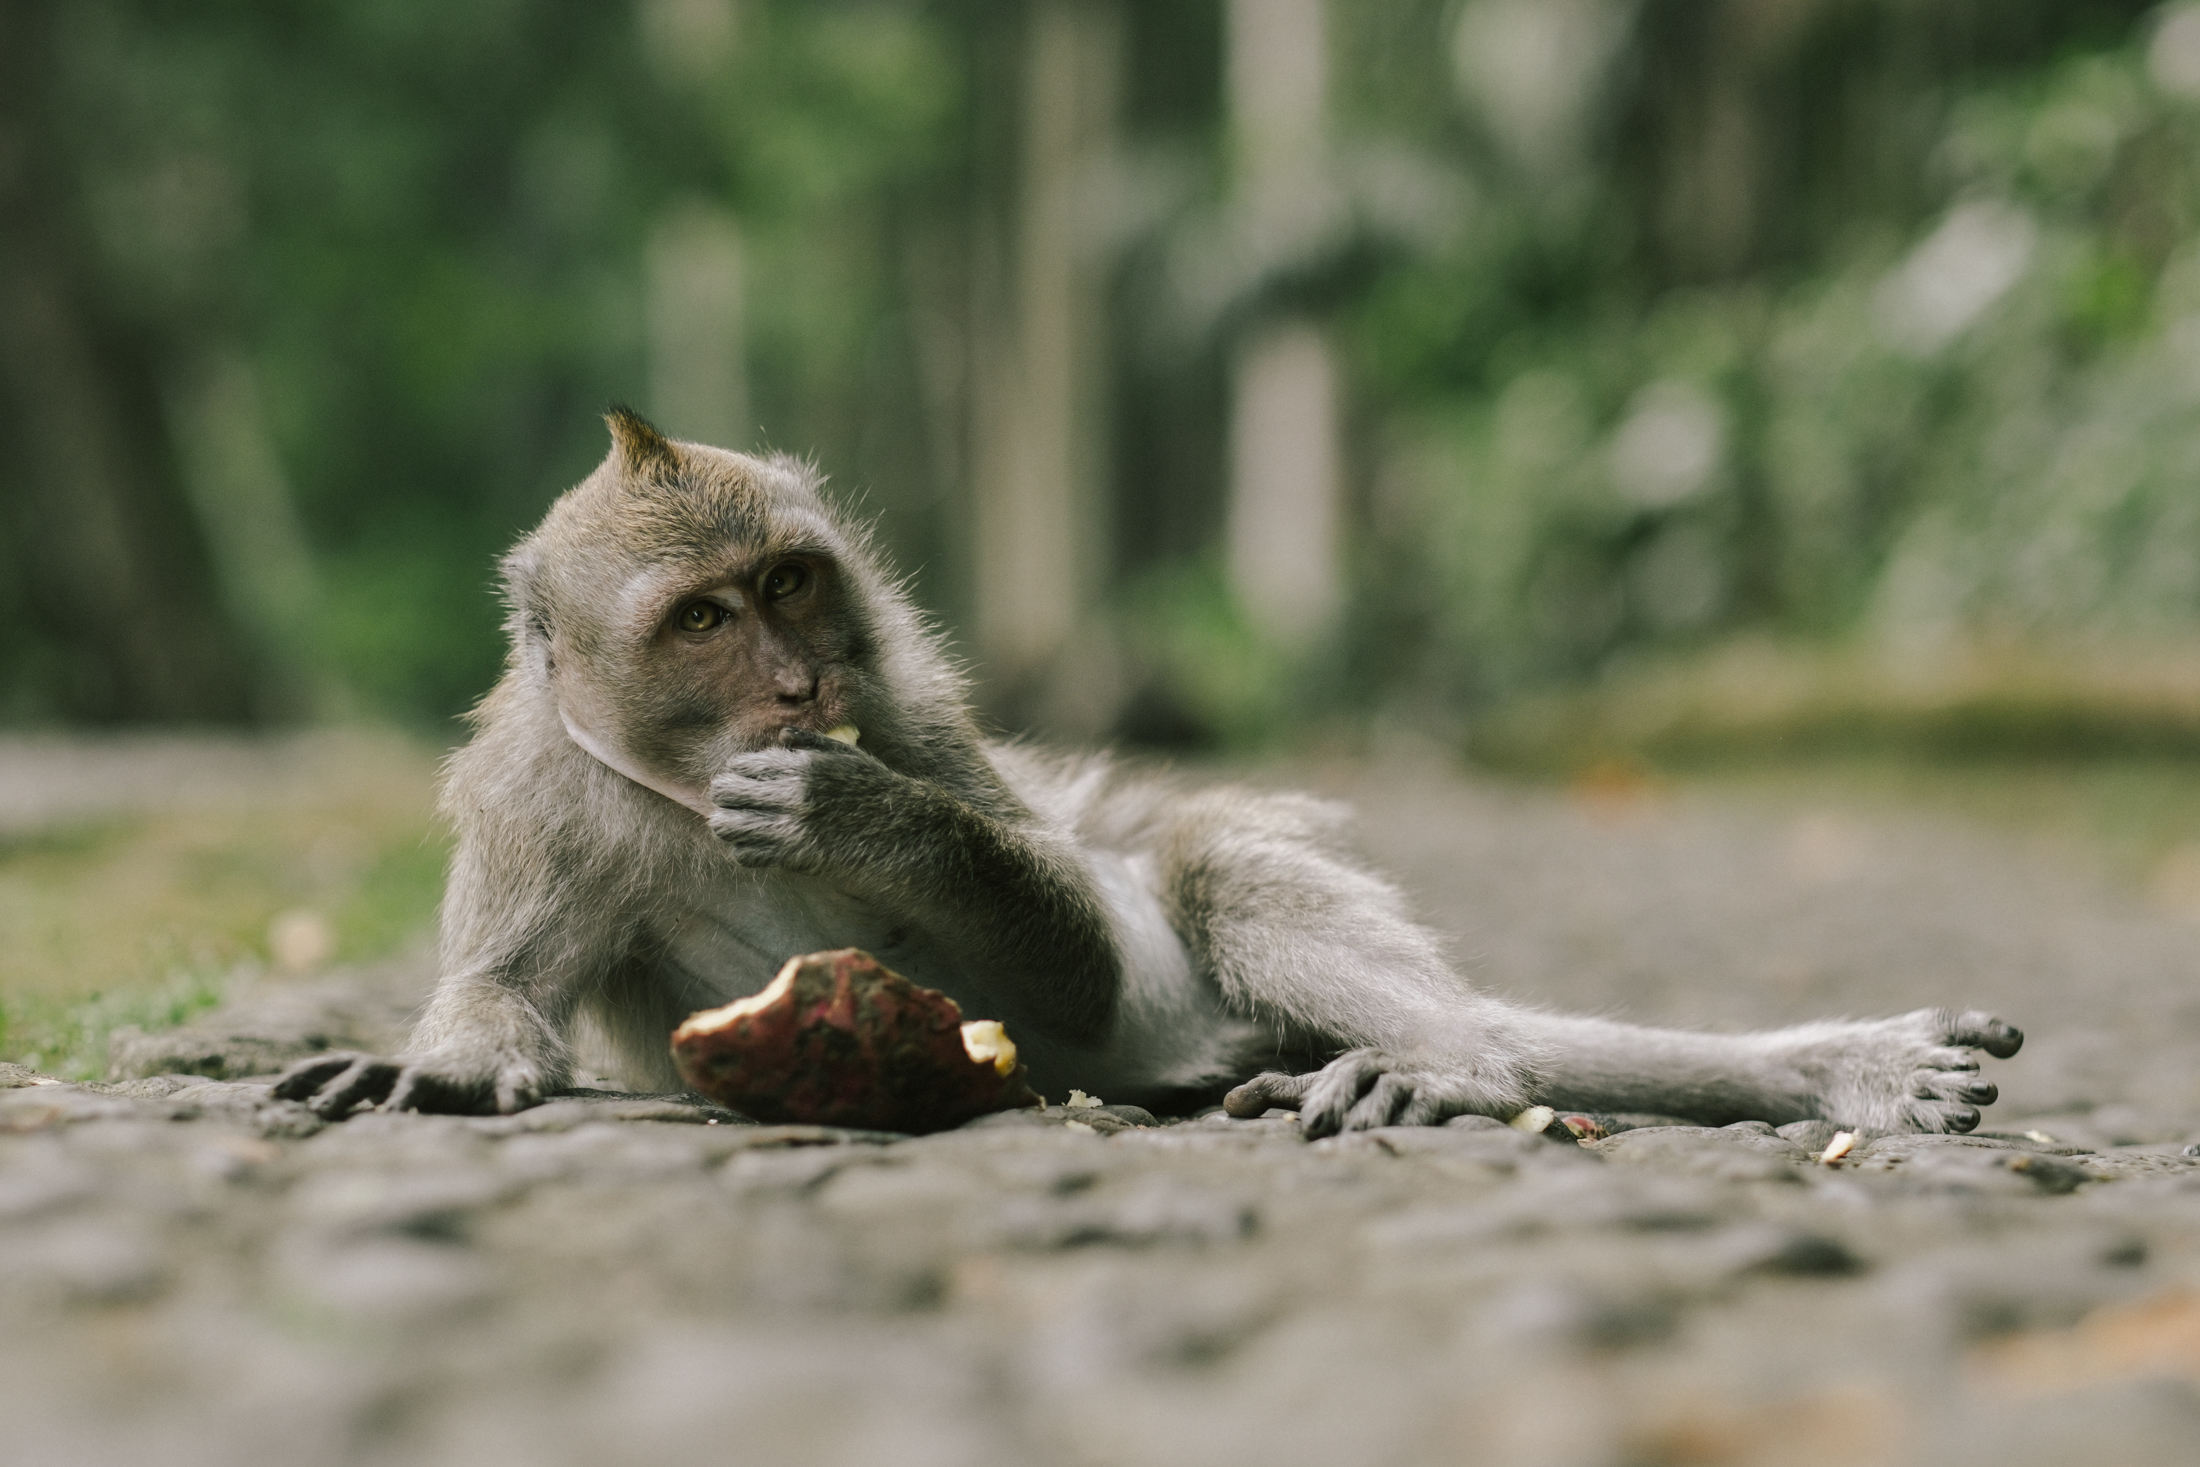 bali_day9_monkey-36.jpg